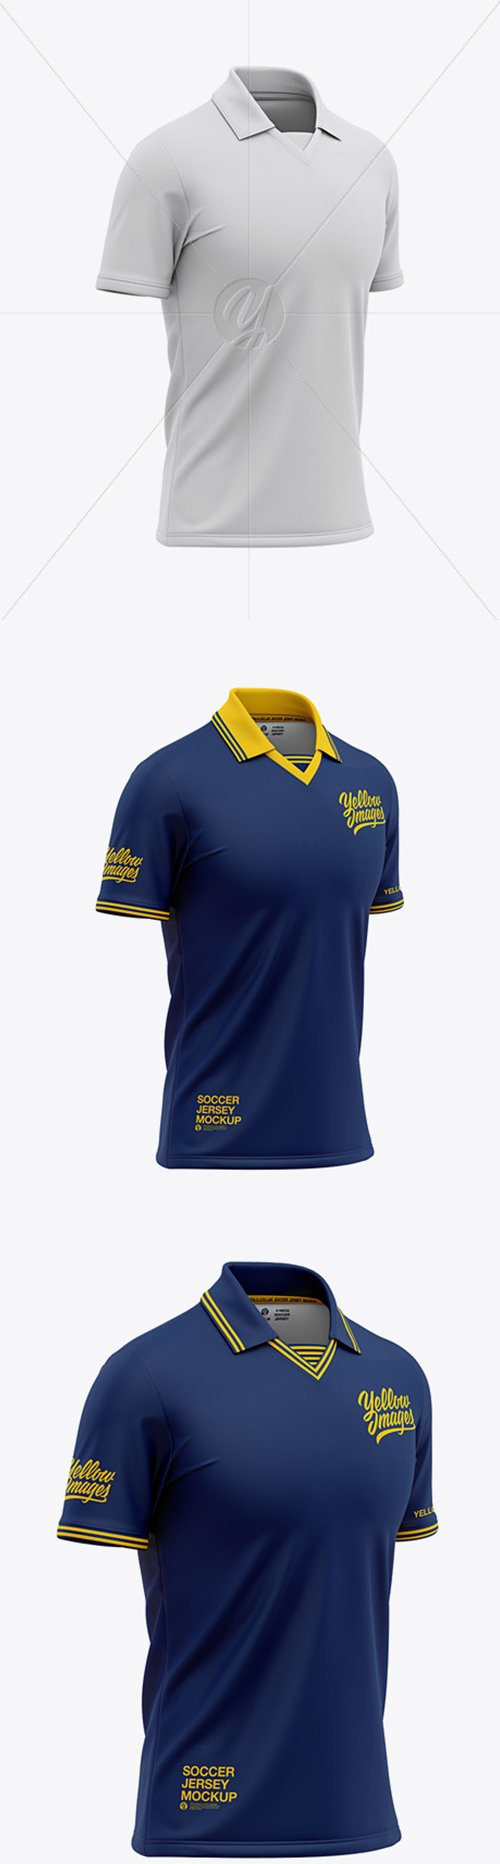 Mens Soccer /Cricket Jersey Mockup - Front Half Side View 47630